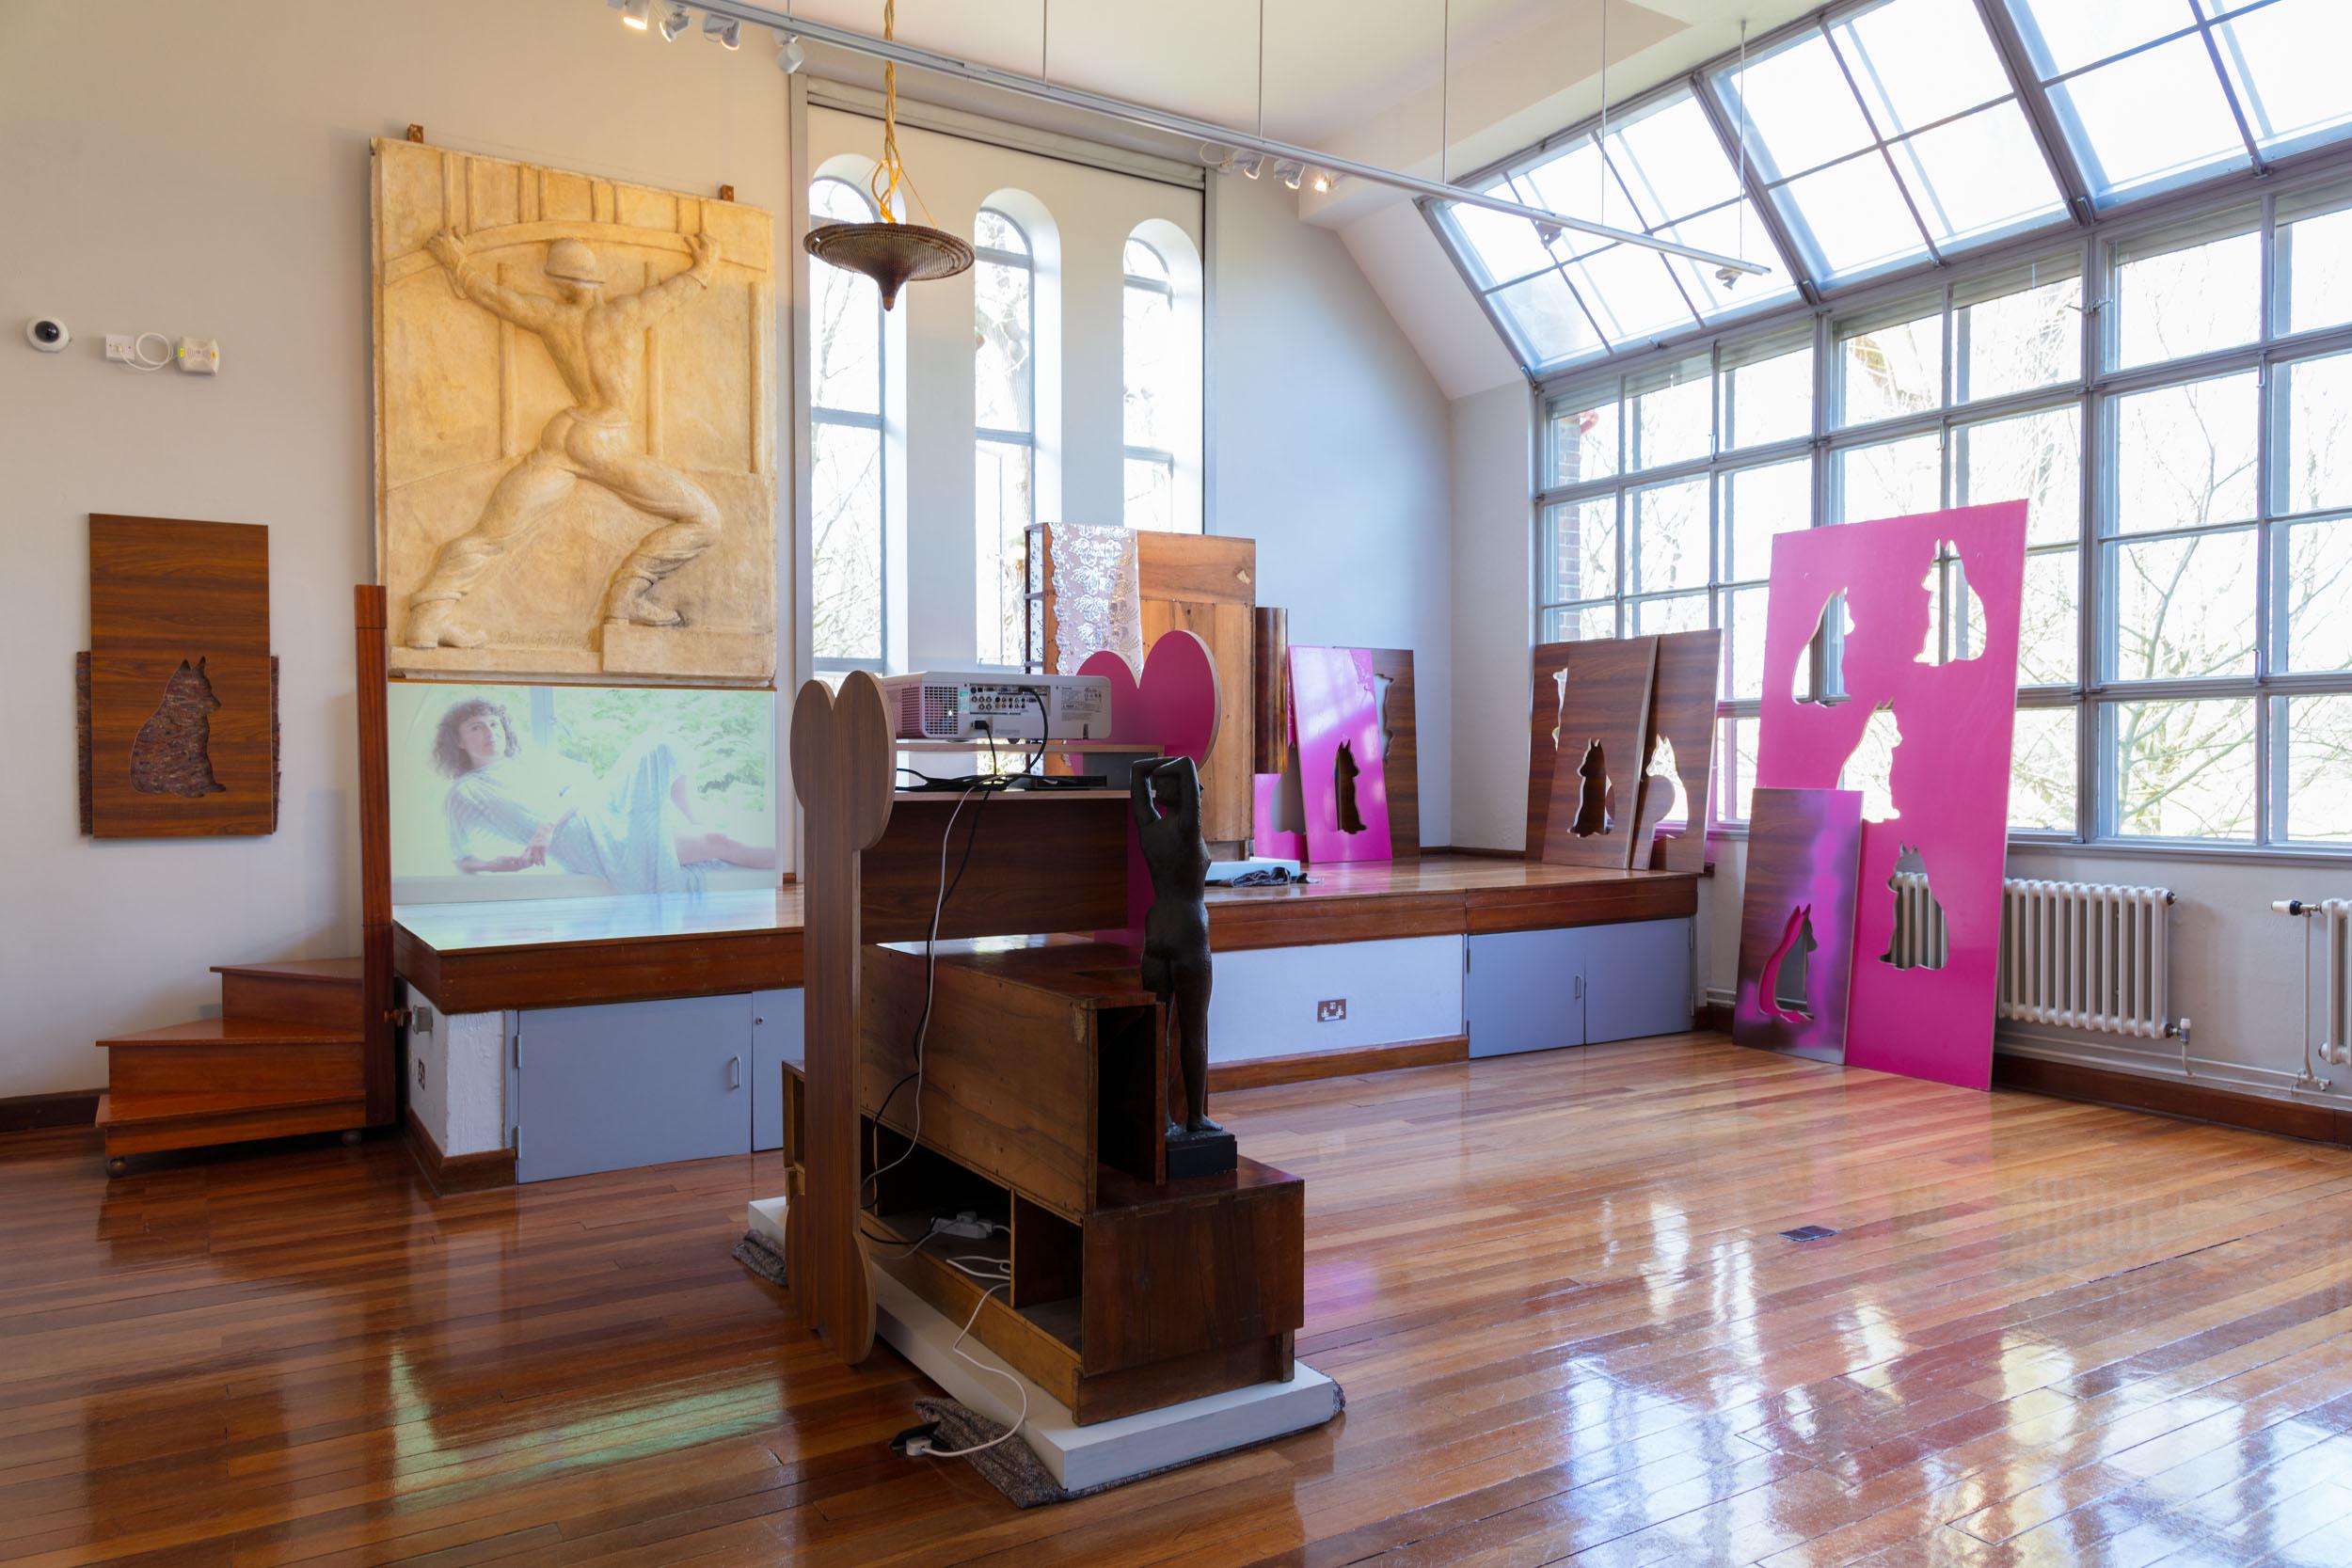 Hilary Lloyd - Awful Girls exhibition. Dorich House Museum modelling studio.